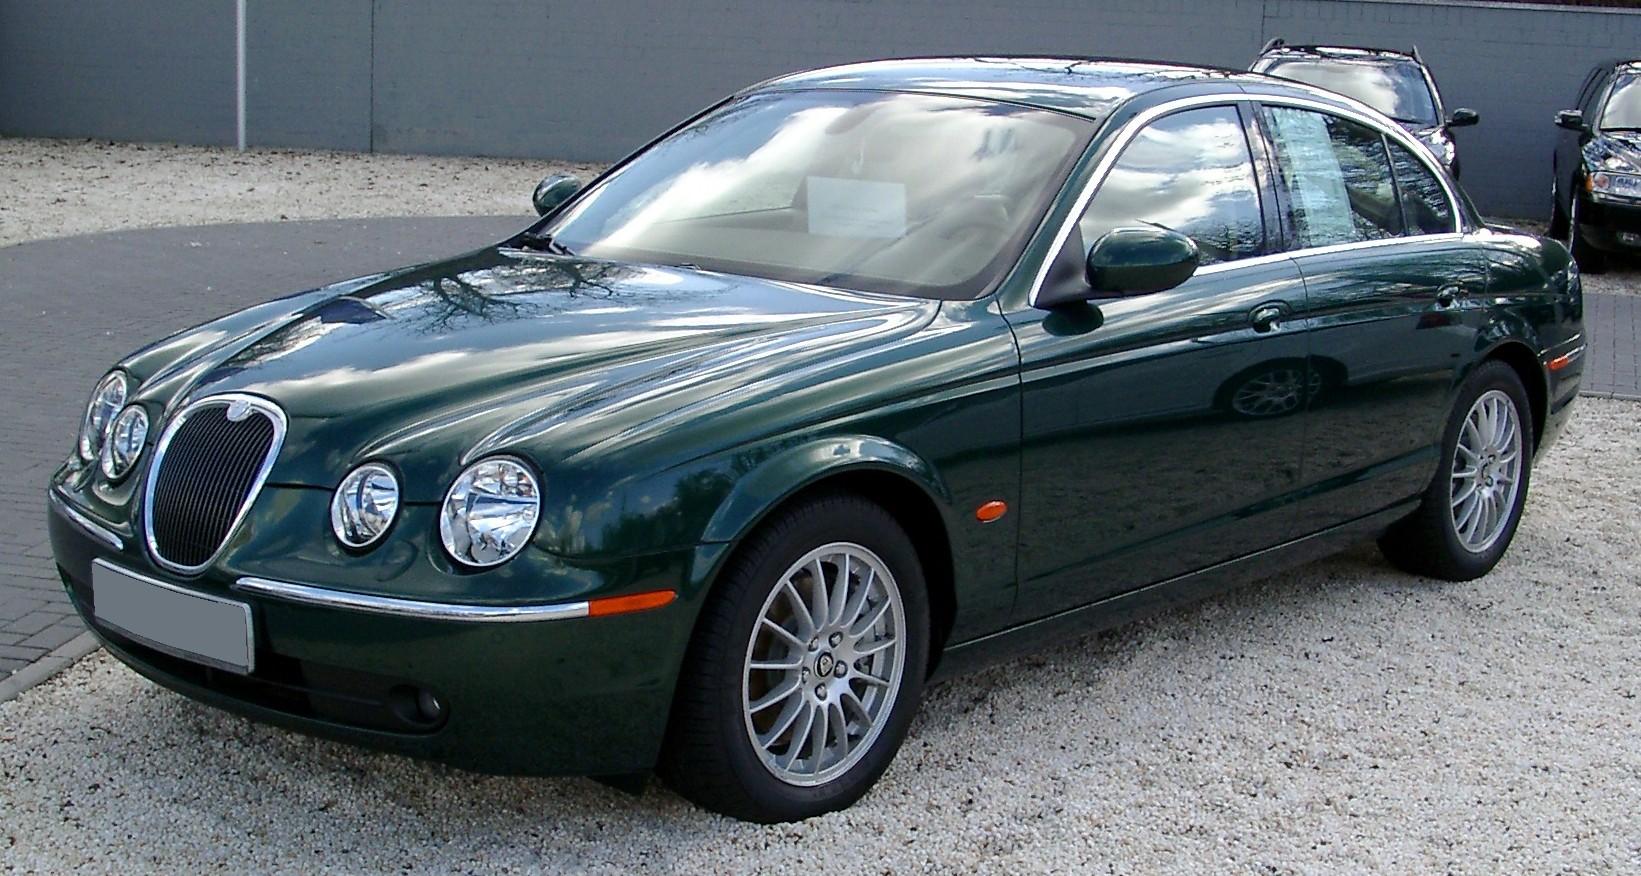 retro cars jaguar forums jaguar enthusiasts forum. Black Bedroom Furniture Sets. Home Design Ideas